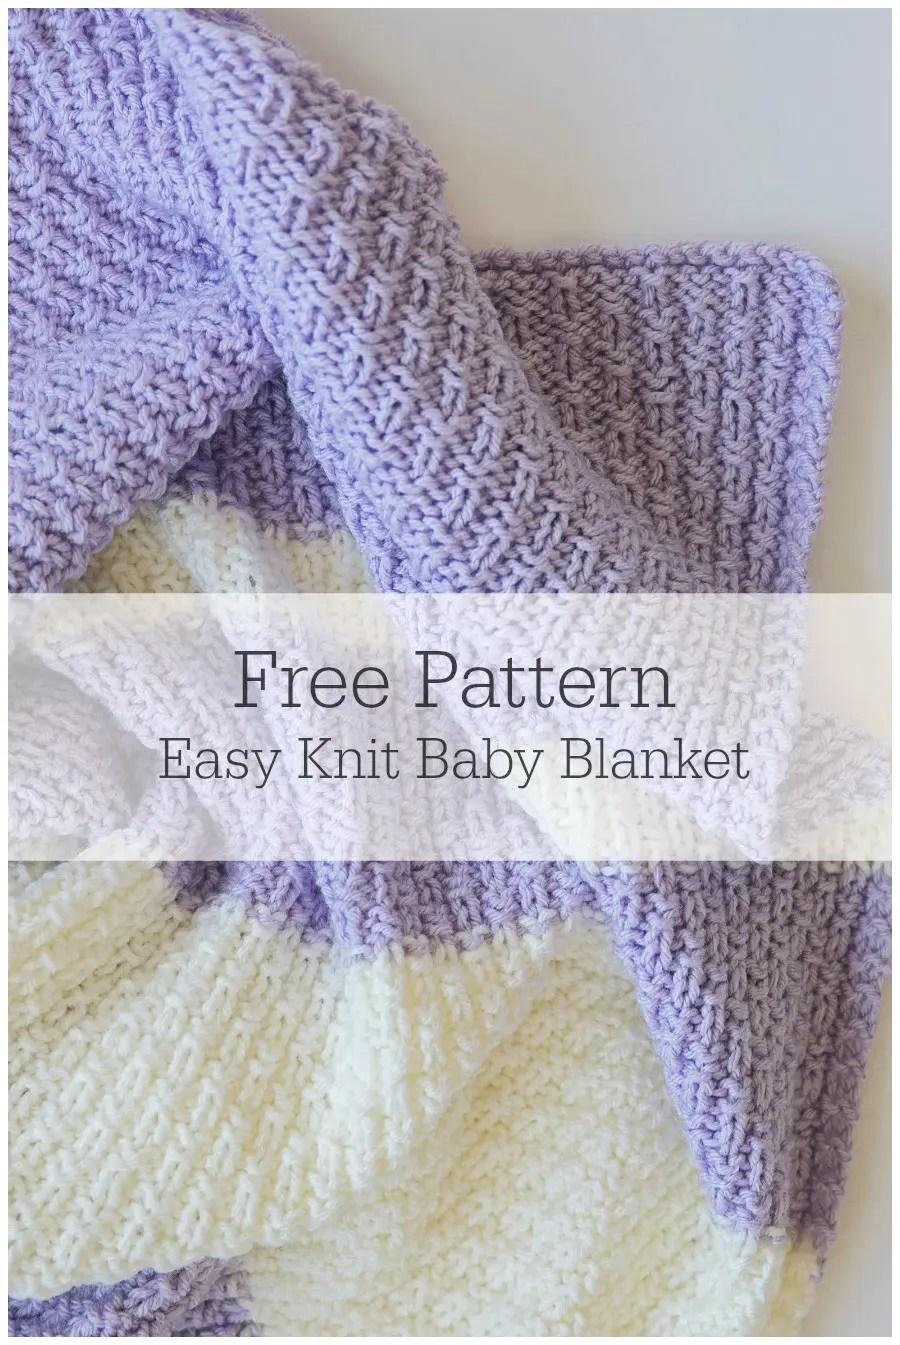 Easy Knit Baby Blanket Pattern - Leelee KnitsLeelee Knits